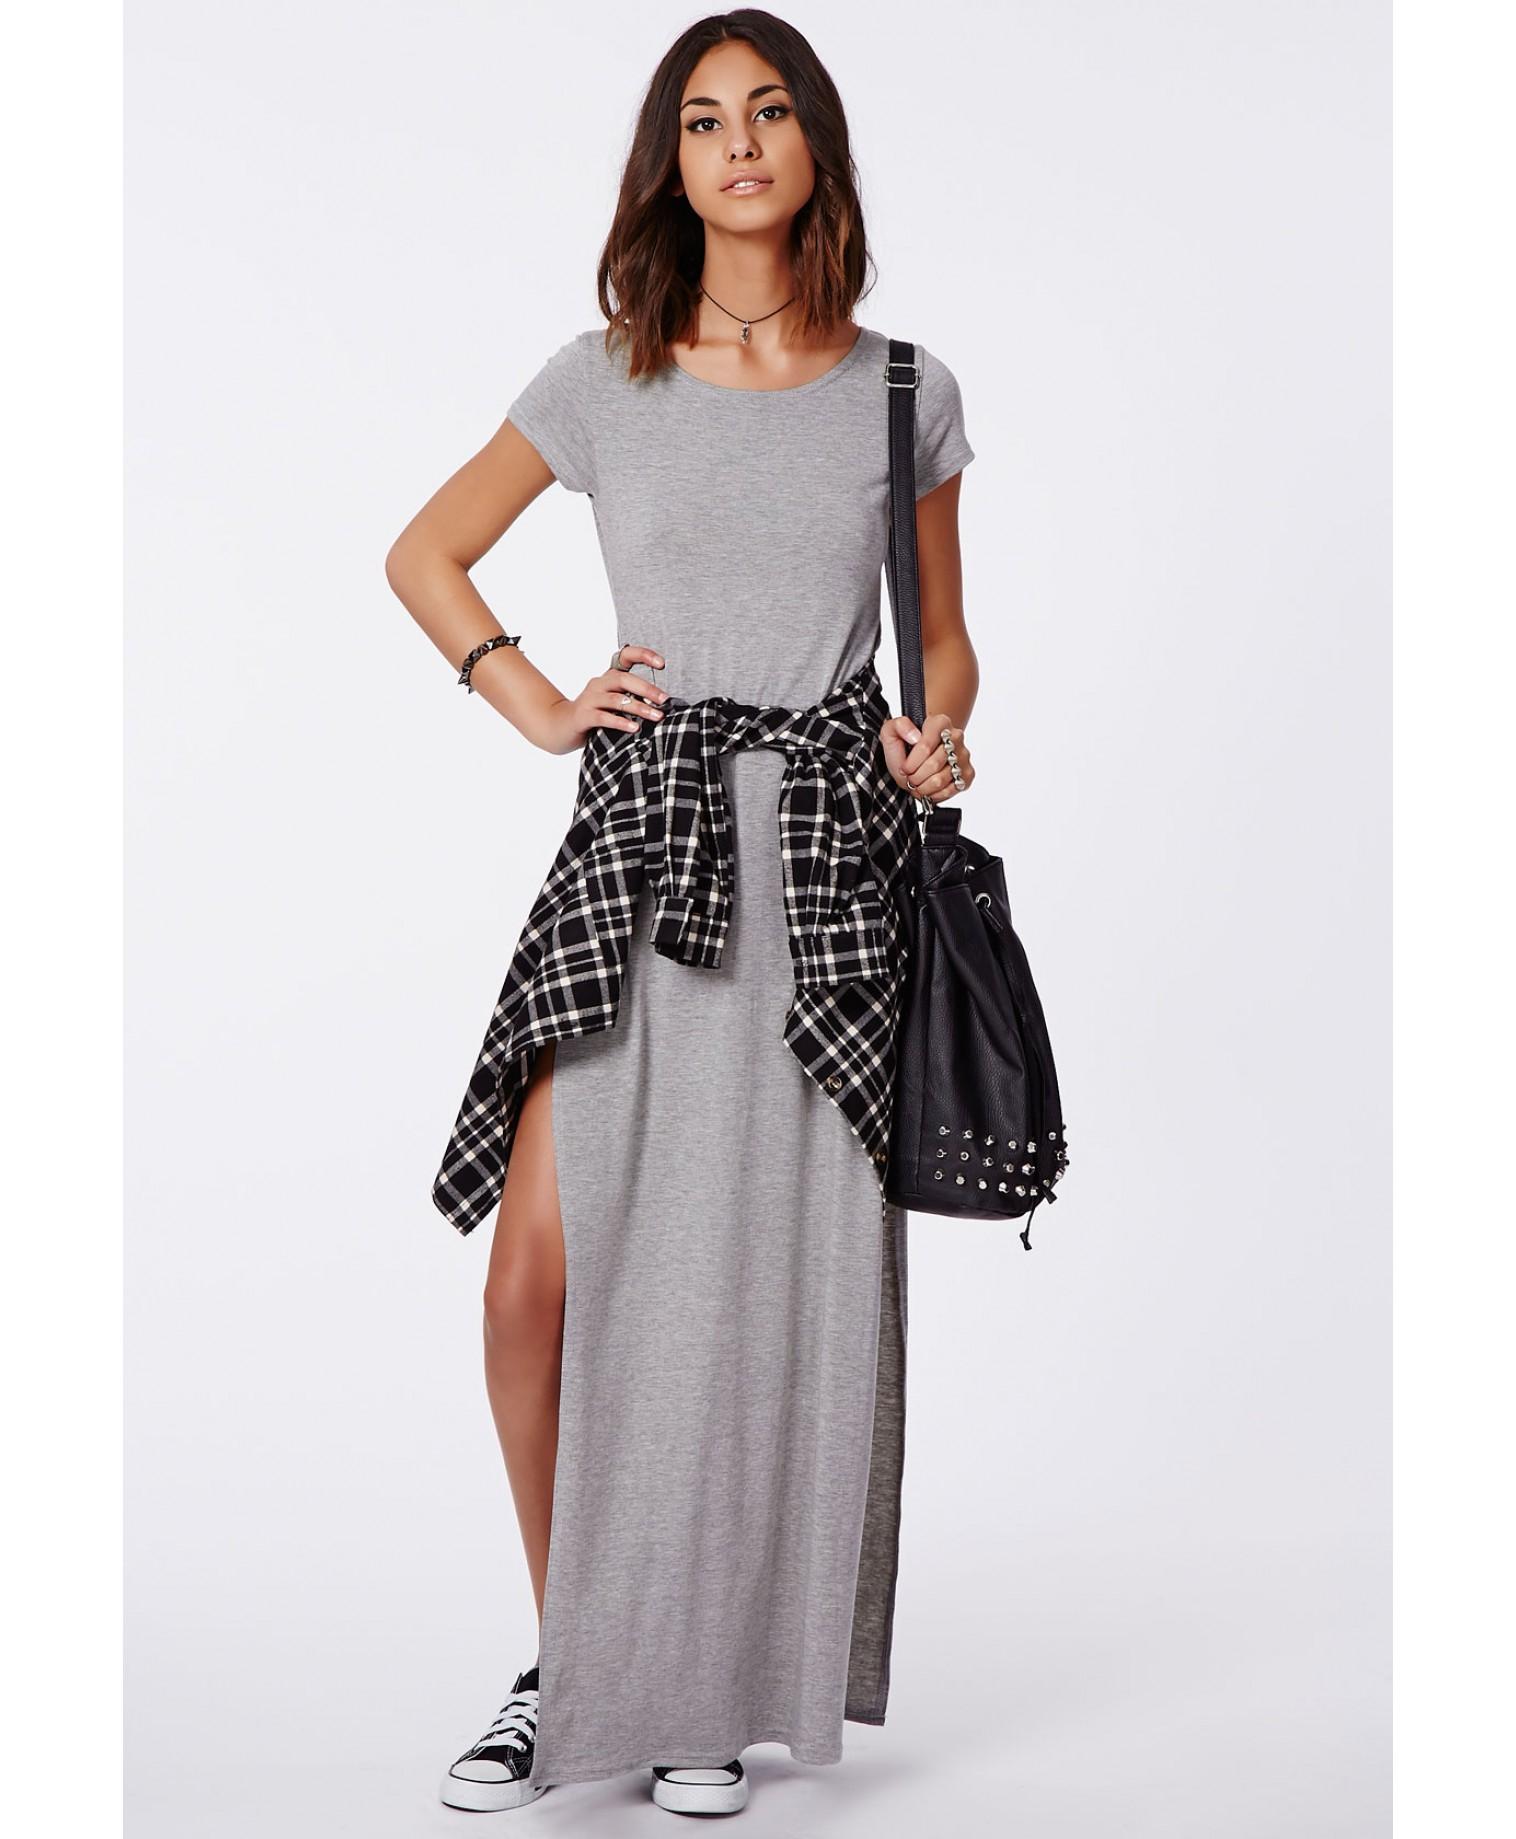 c3fa660d26 T Shirt Maxi Dress With Side Slits - Data Dynamic AG